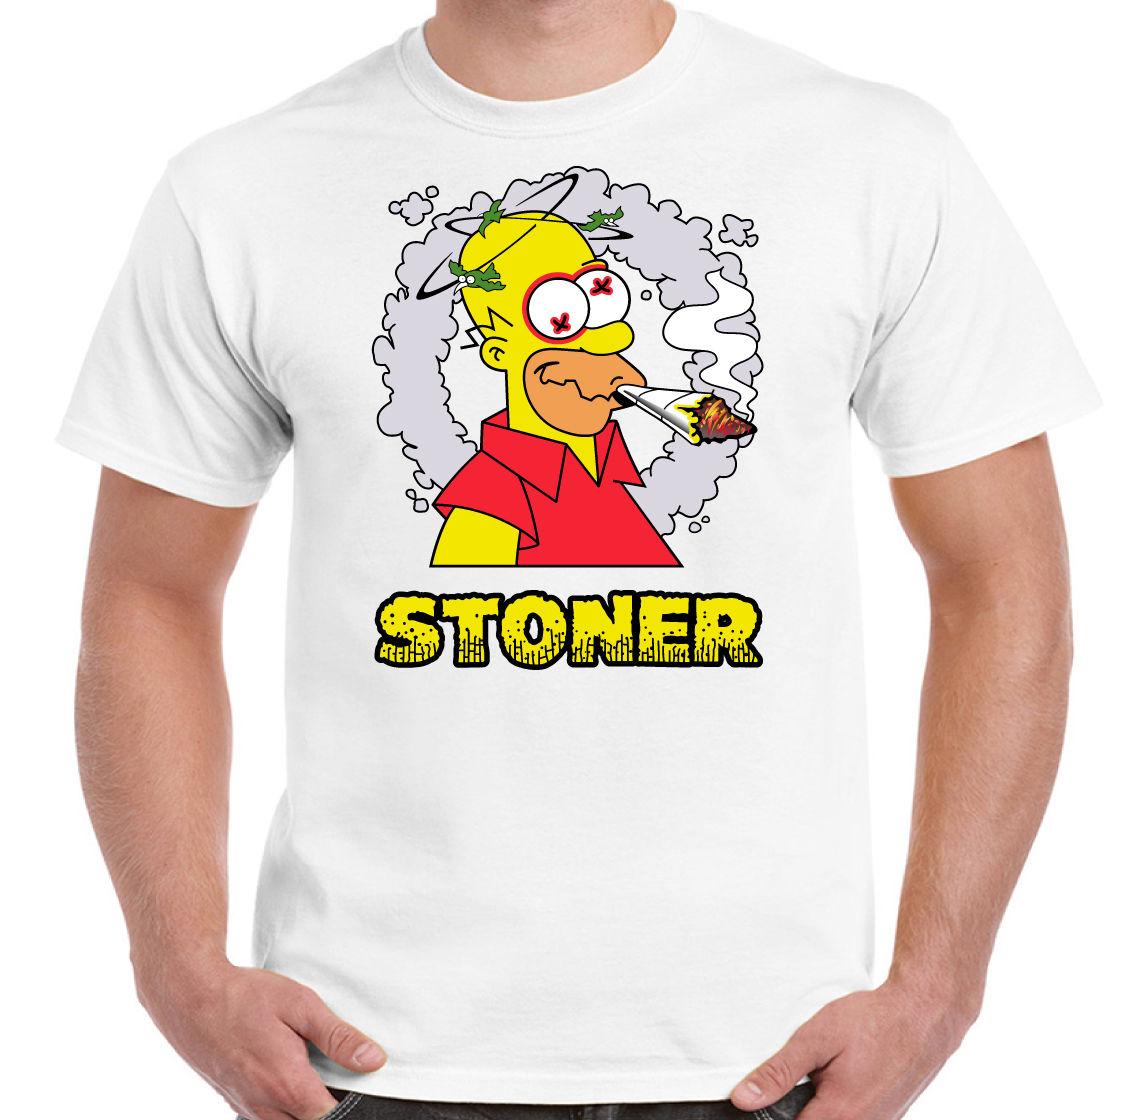 Stoner Mens Funny T-Shirt Weed Spliff